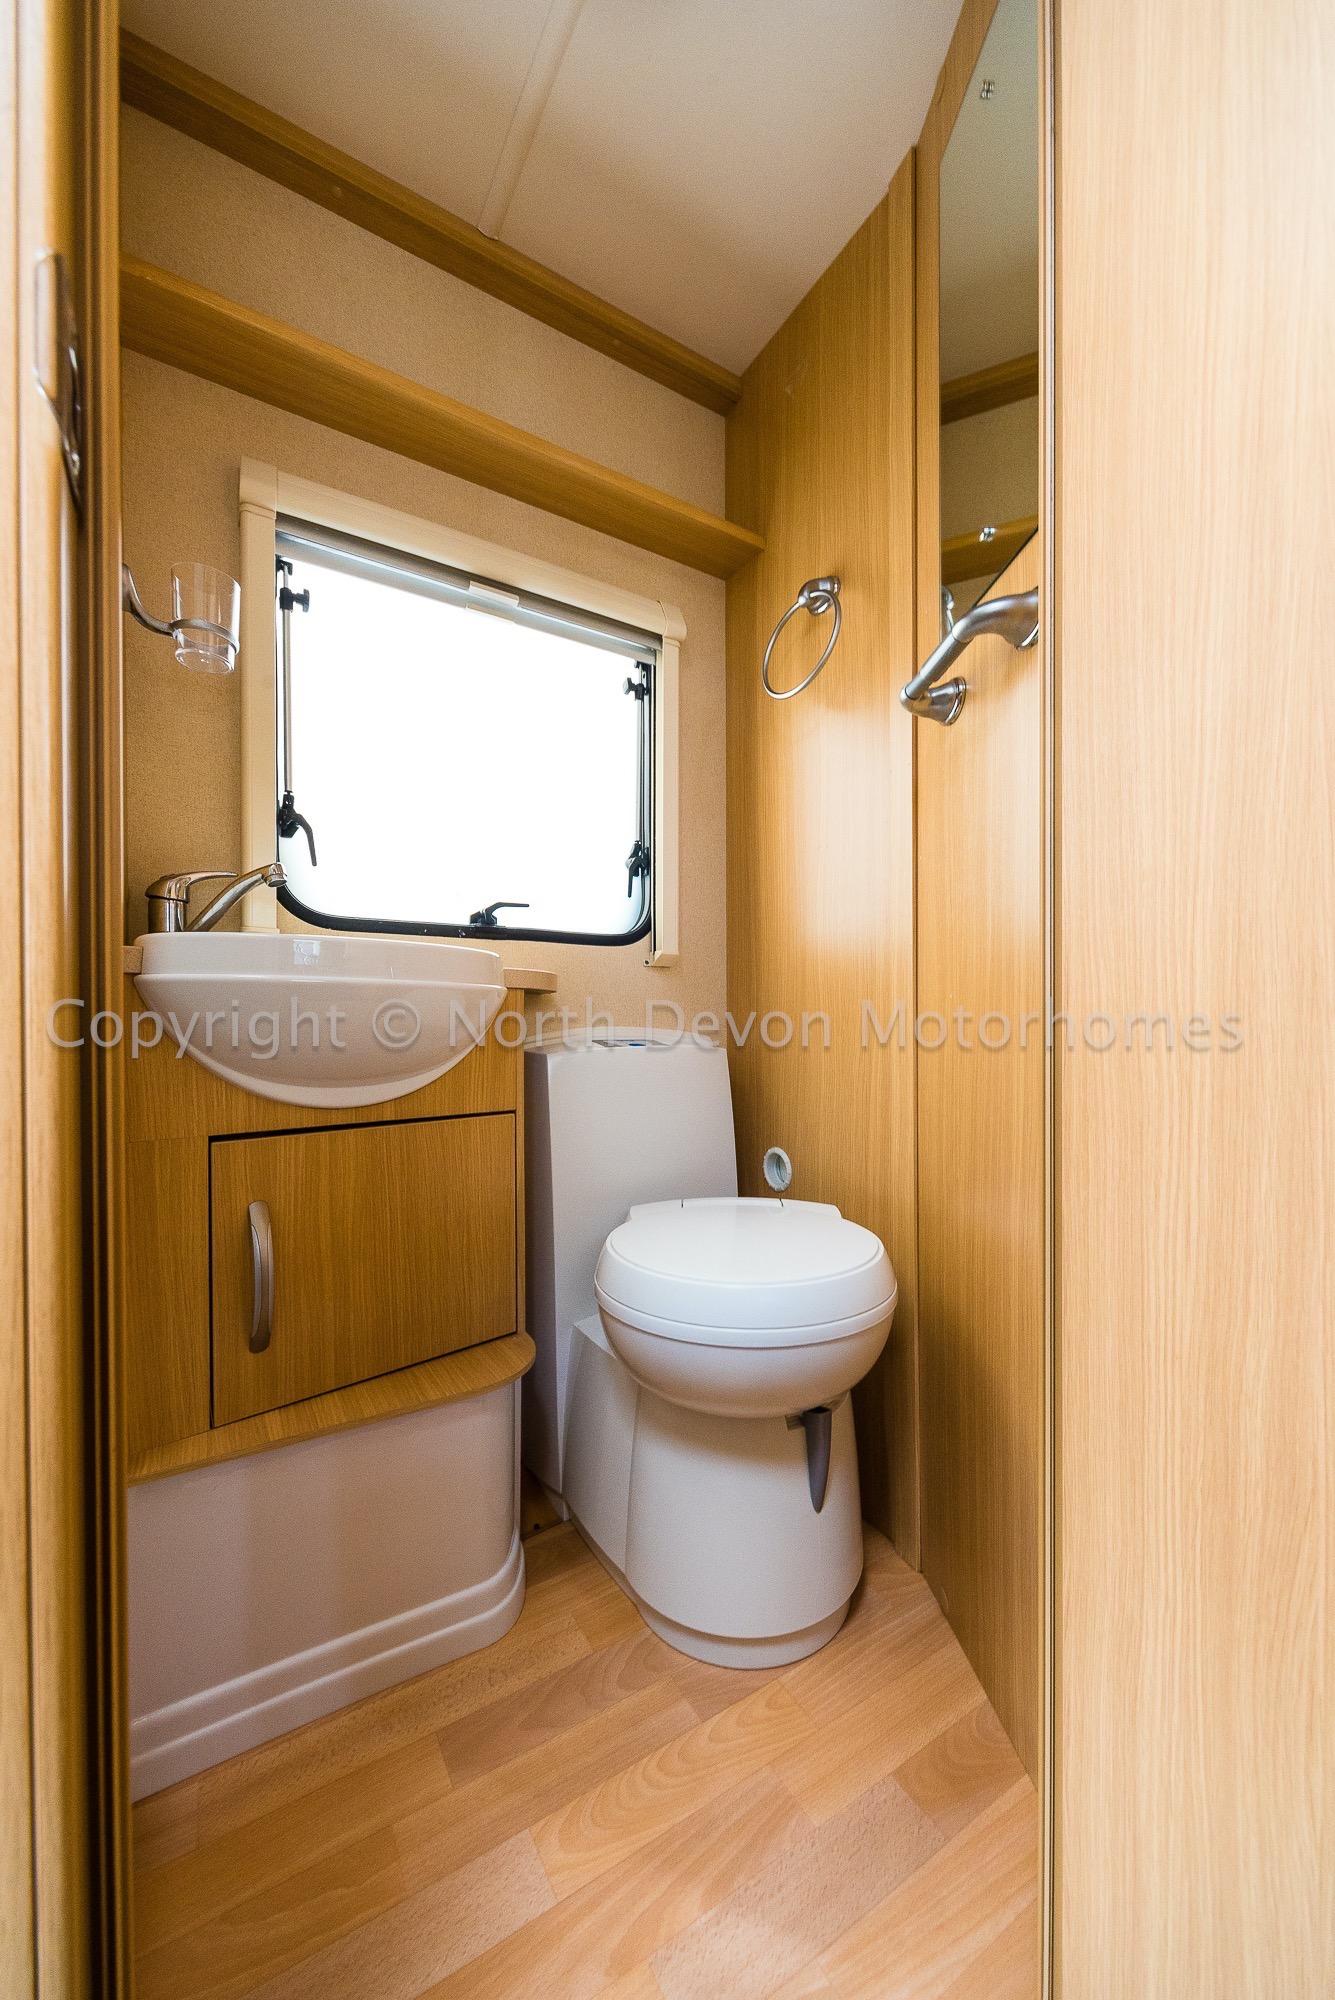 Under Sink Cabinet Bathroom Storage Unit Specials For Birmingham Deebonk